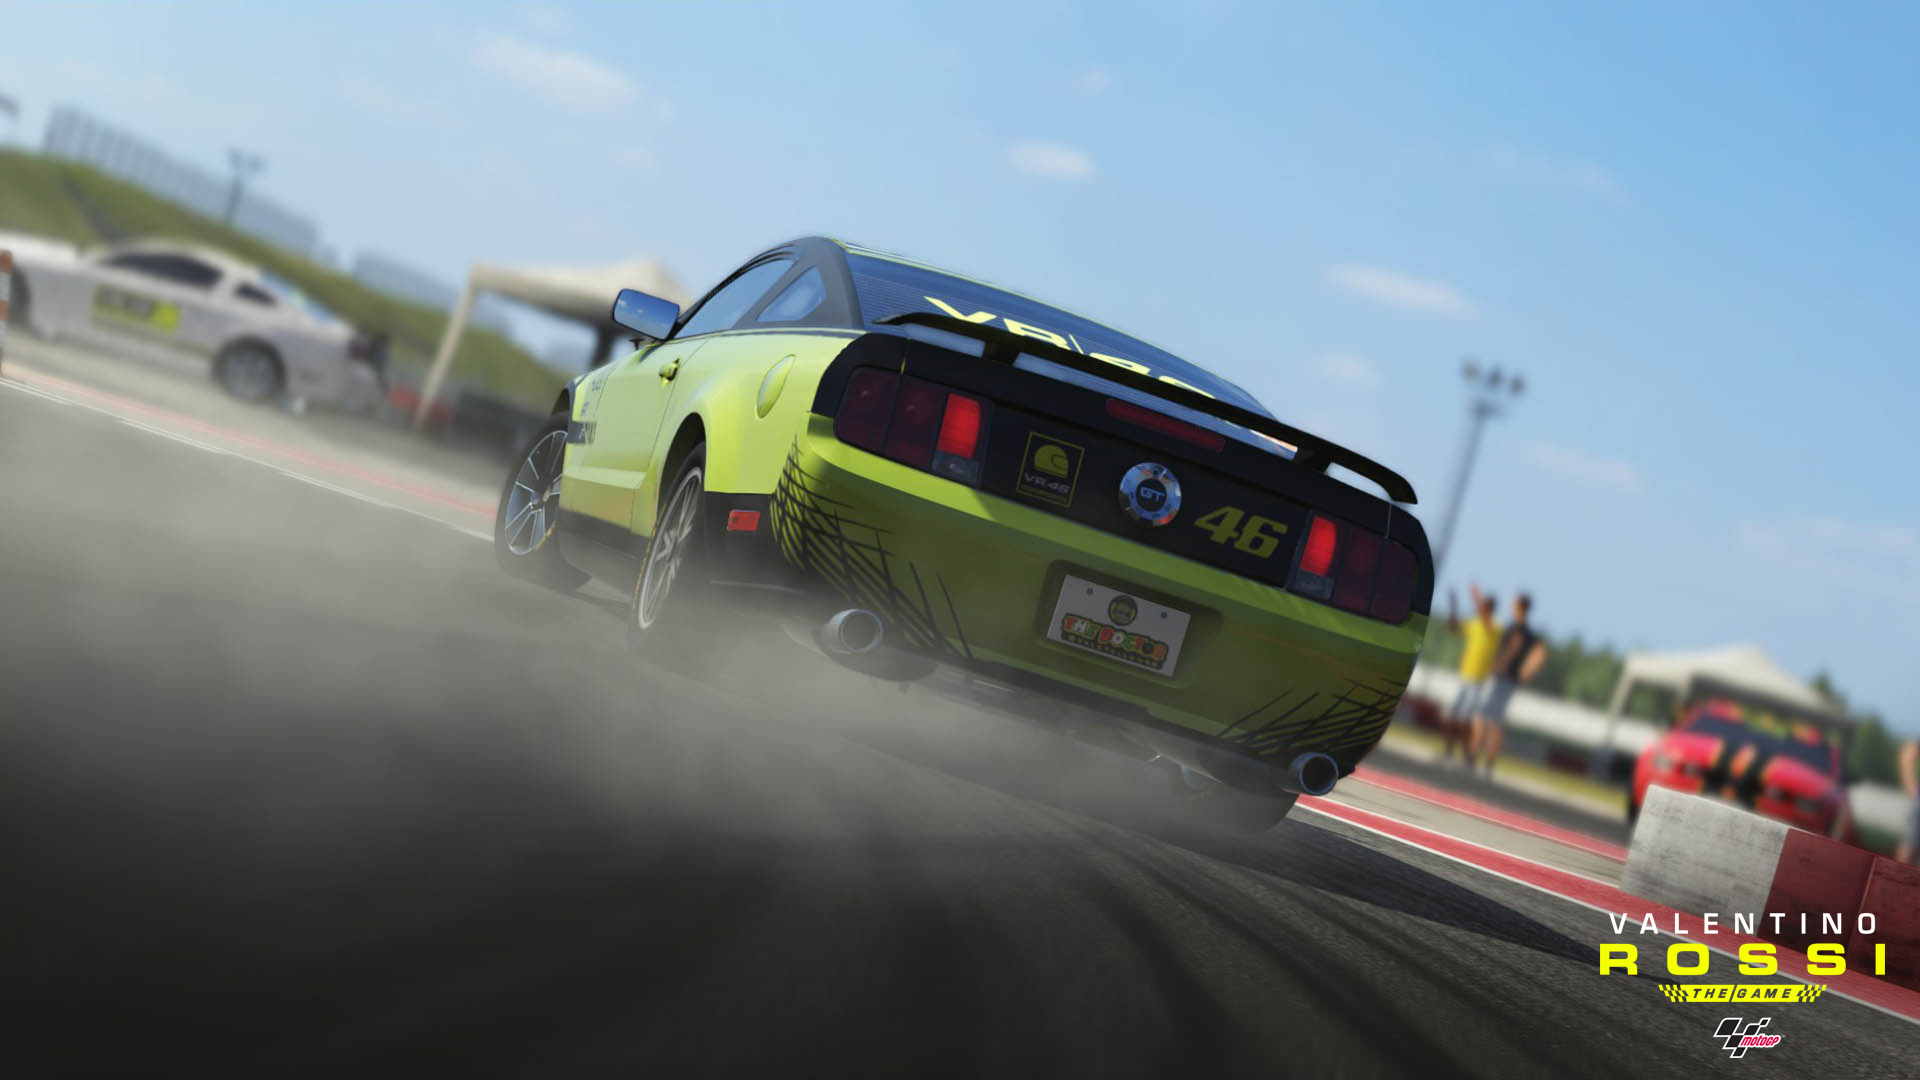 Valentino Rossi The Game Screenshot 2